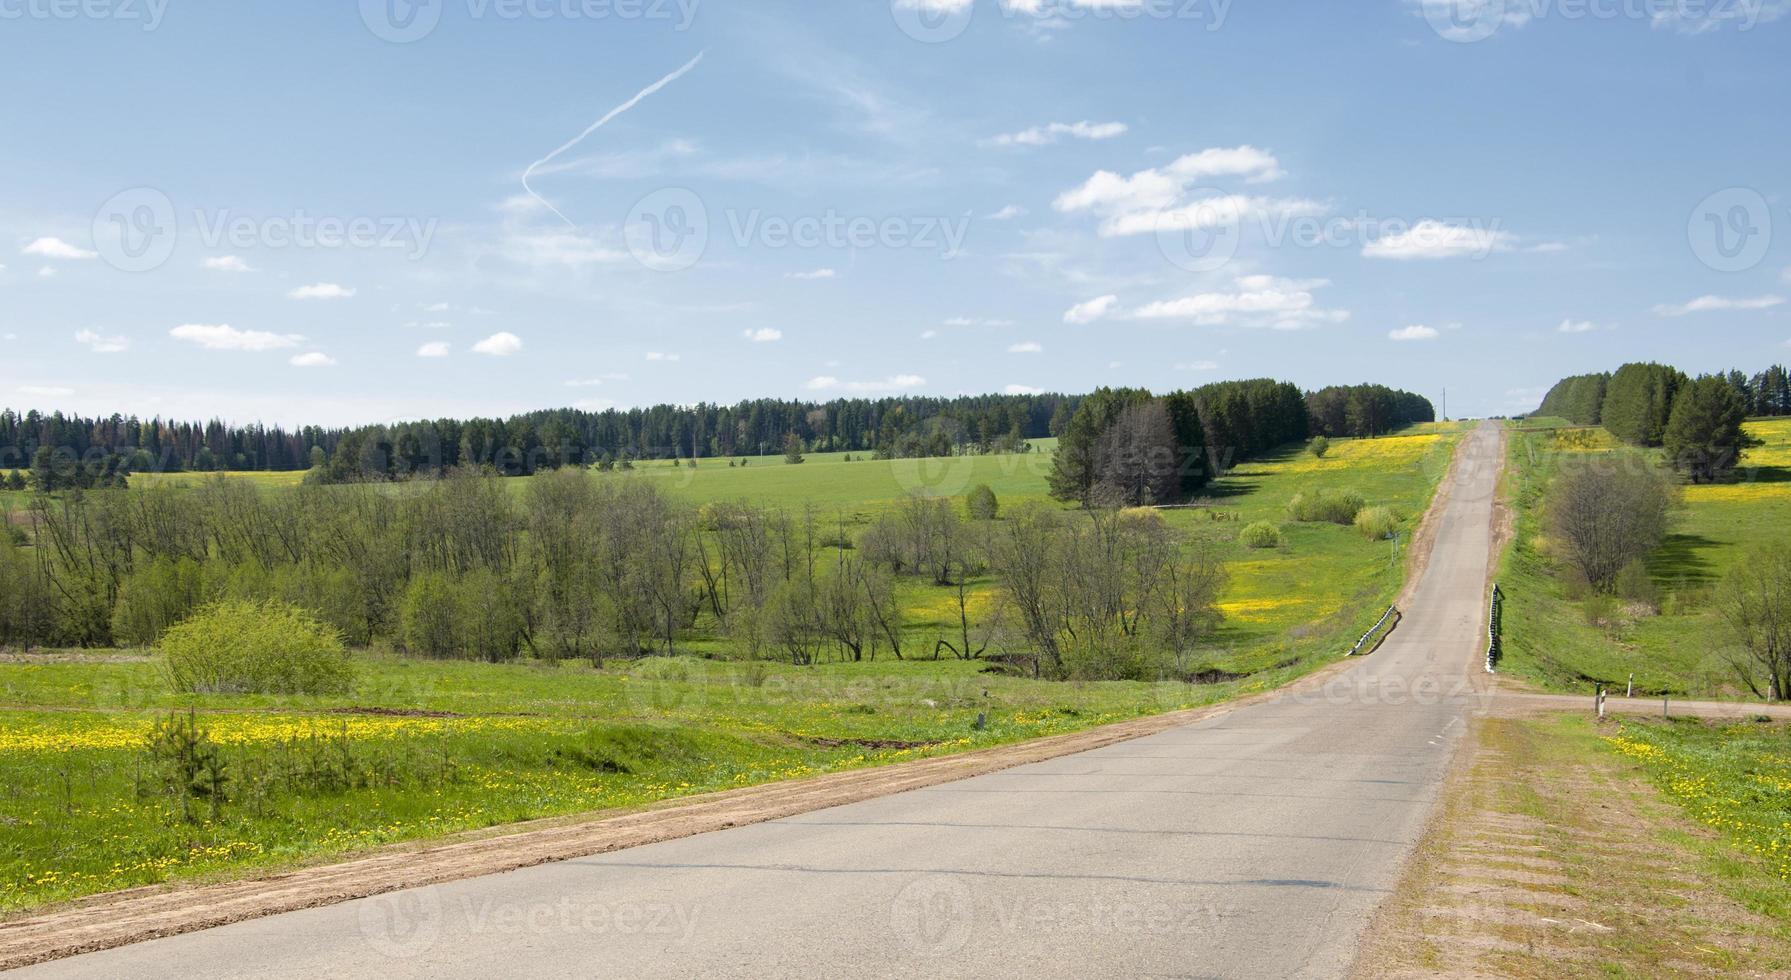 estrada rural. estrada no outono foto